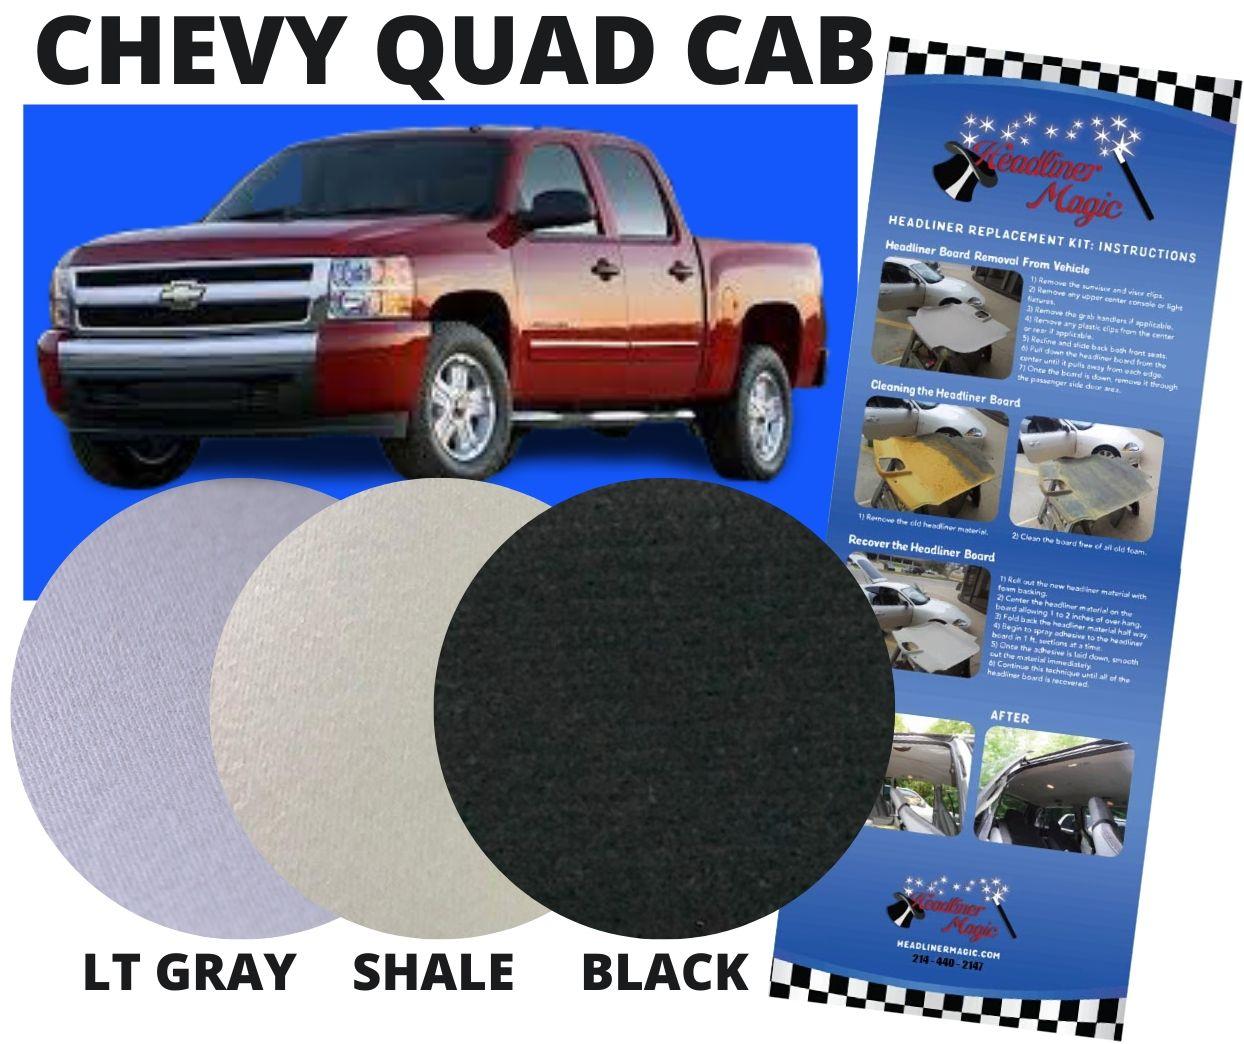 Headliner Replacement for Chevy Silverado Quad Cab Pk